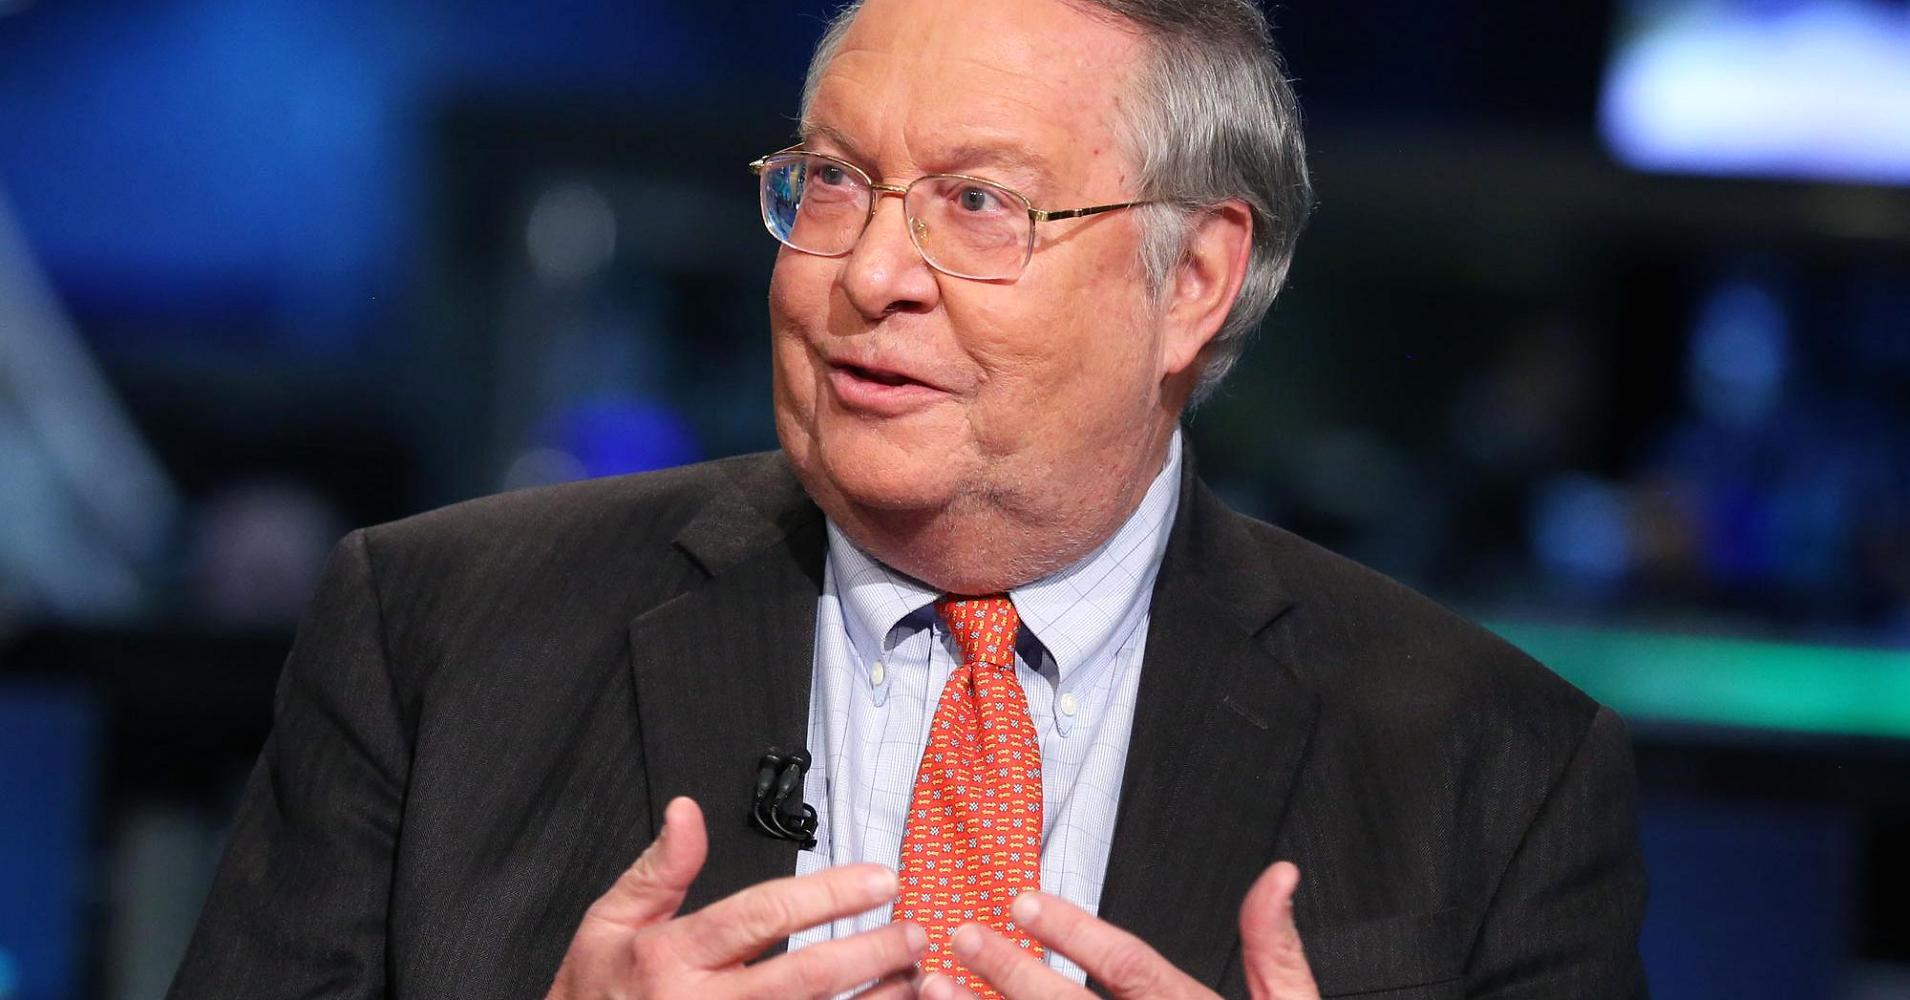 Инвестор-миллиардер Билл Миллер: Каждый крупный инвестиционный банк захочет иметь биткоин